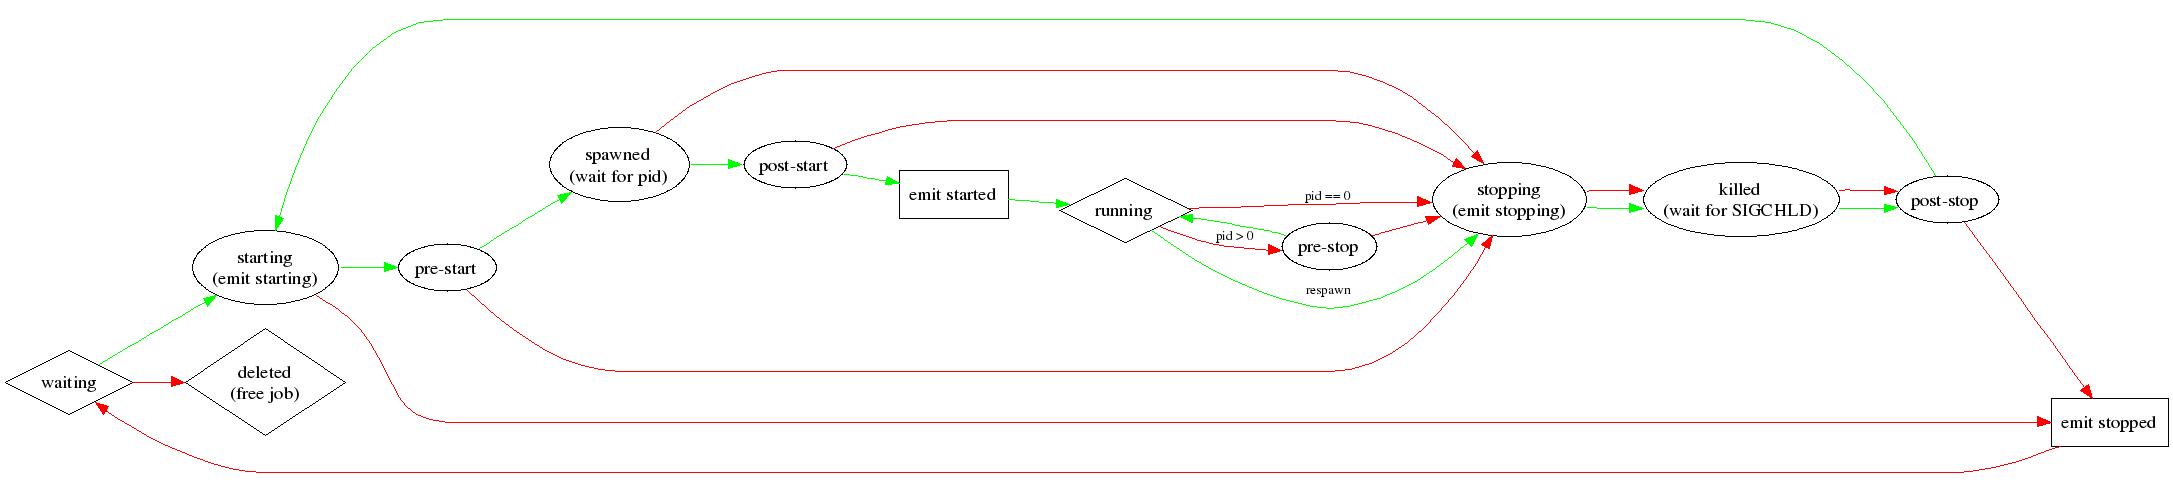 Upstart state transition diagram